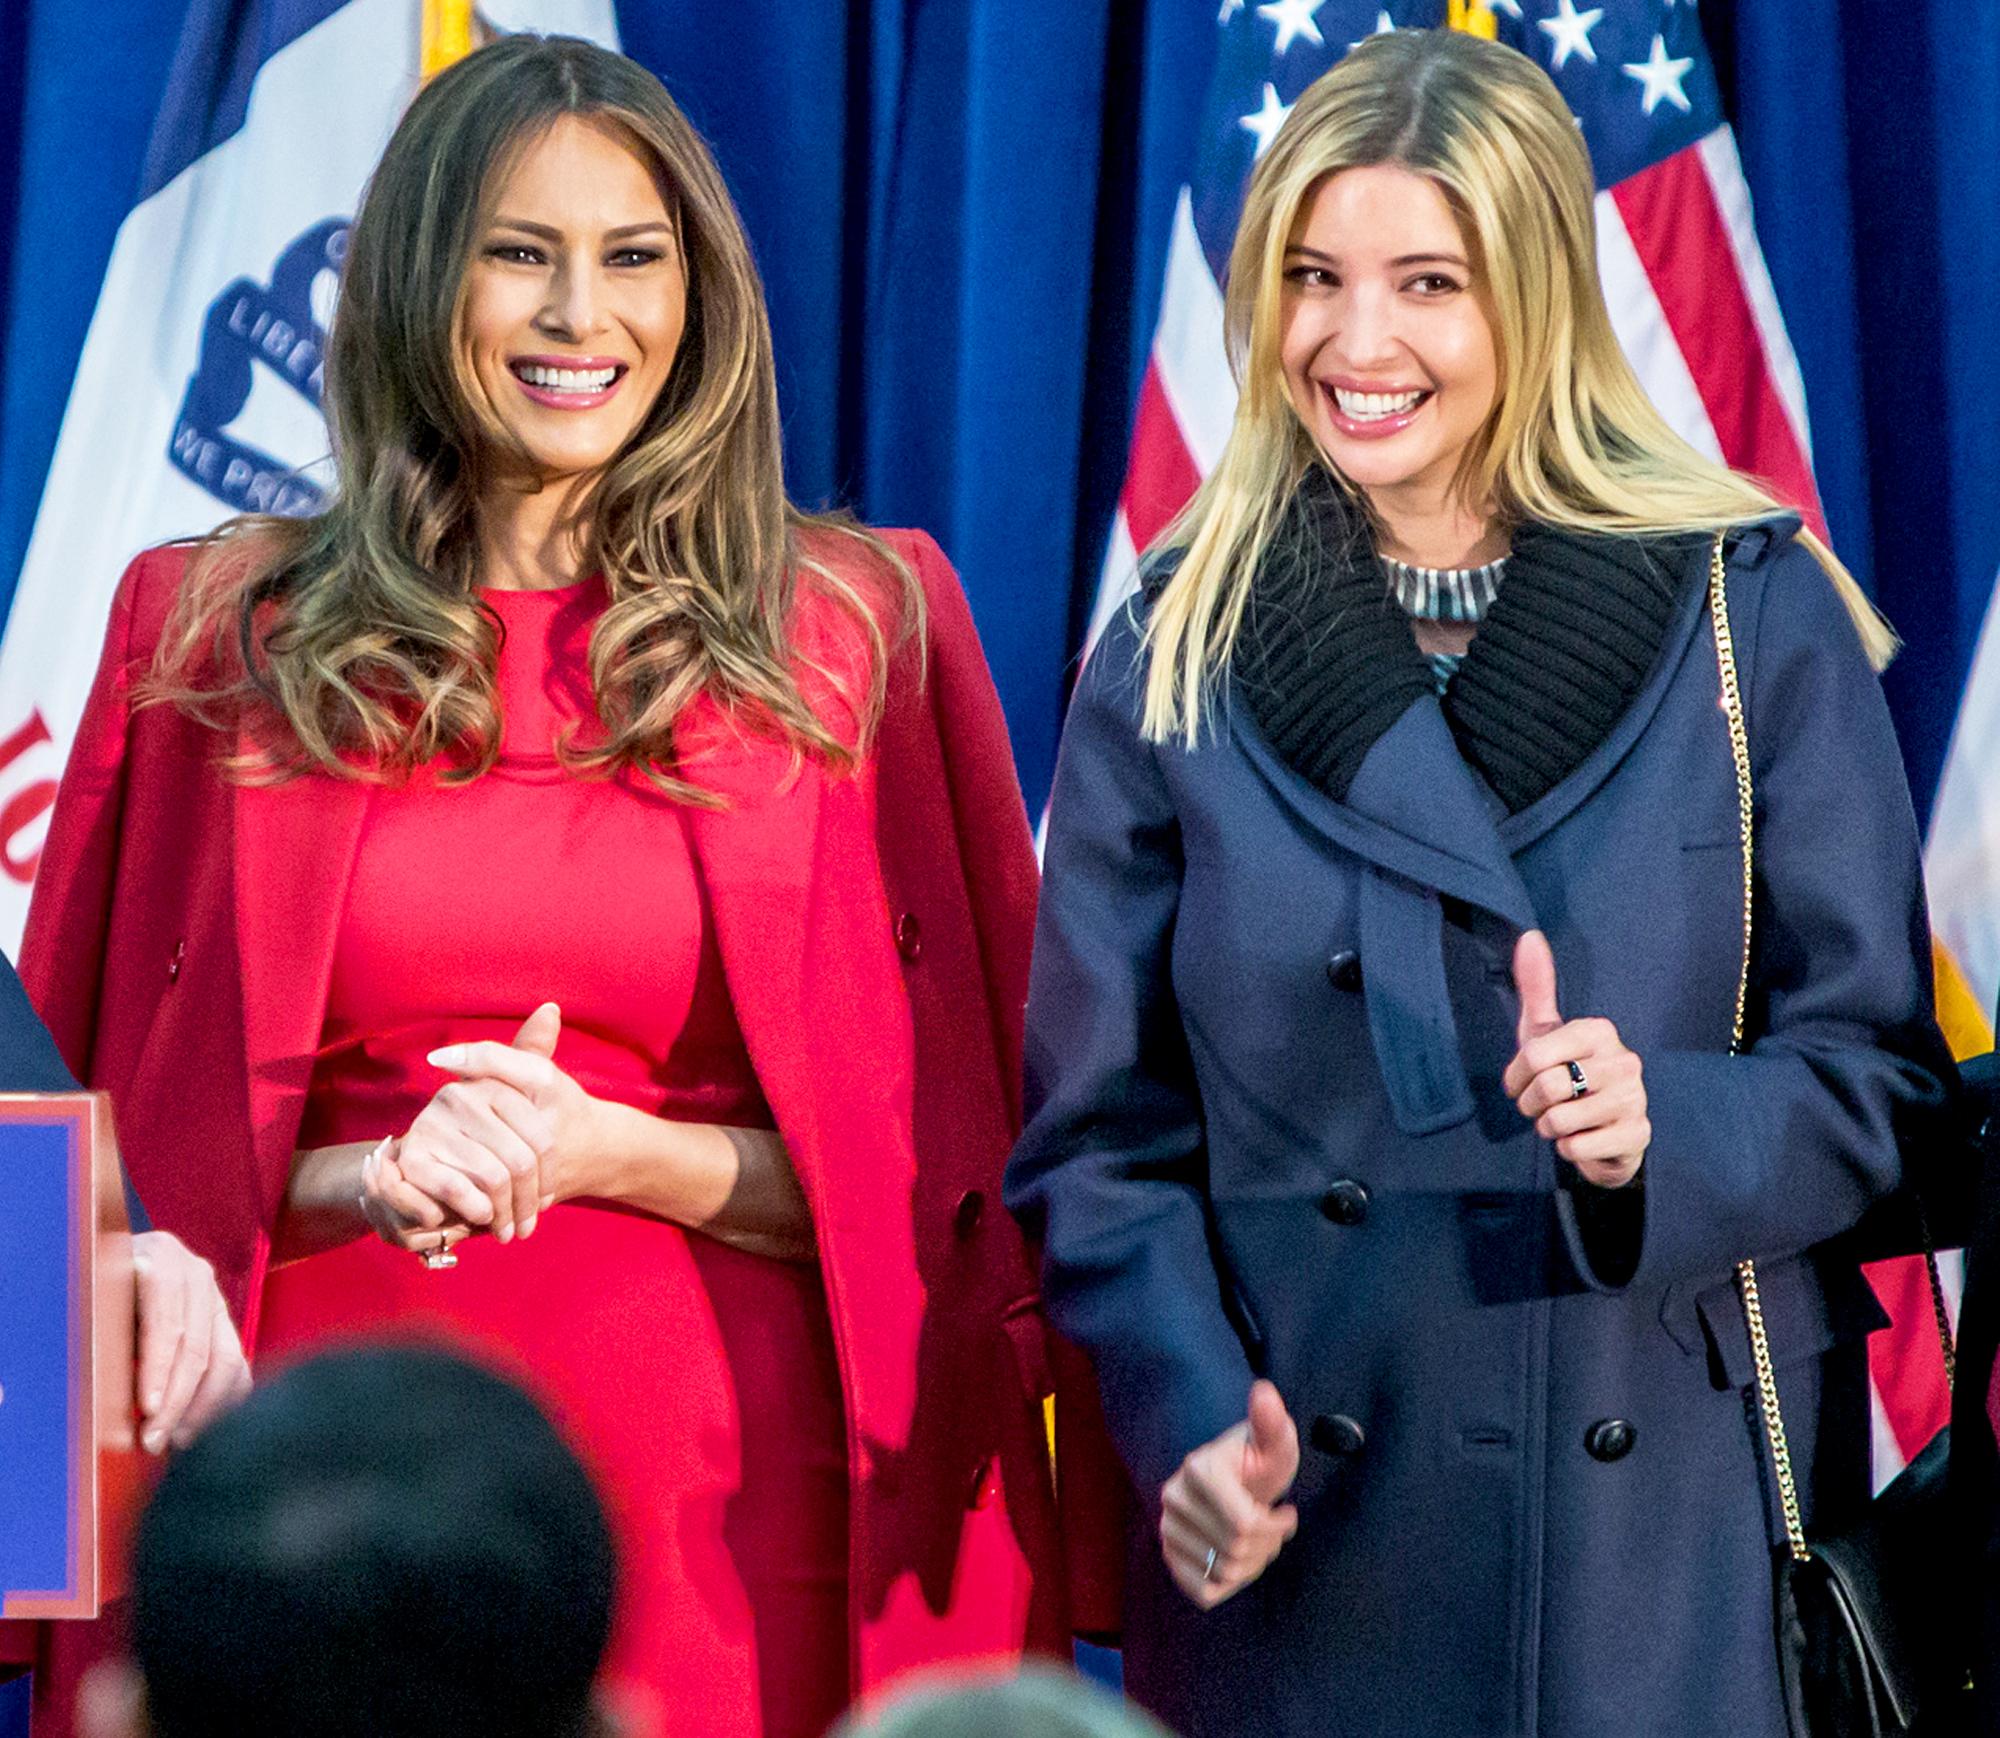 Melania Trump and Ivanka Trump